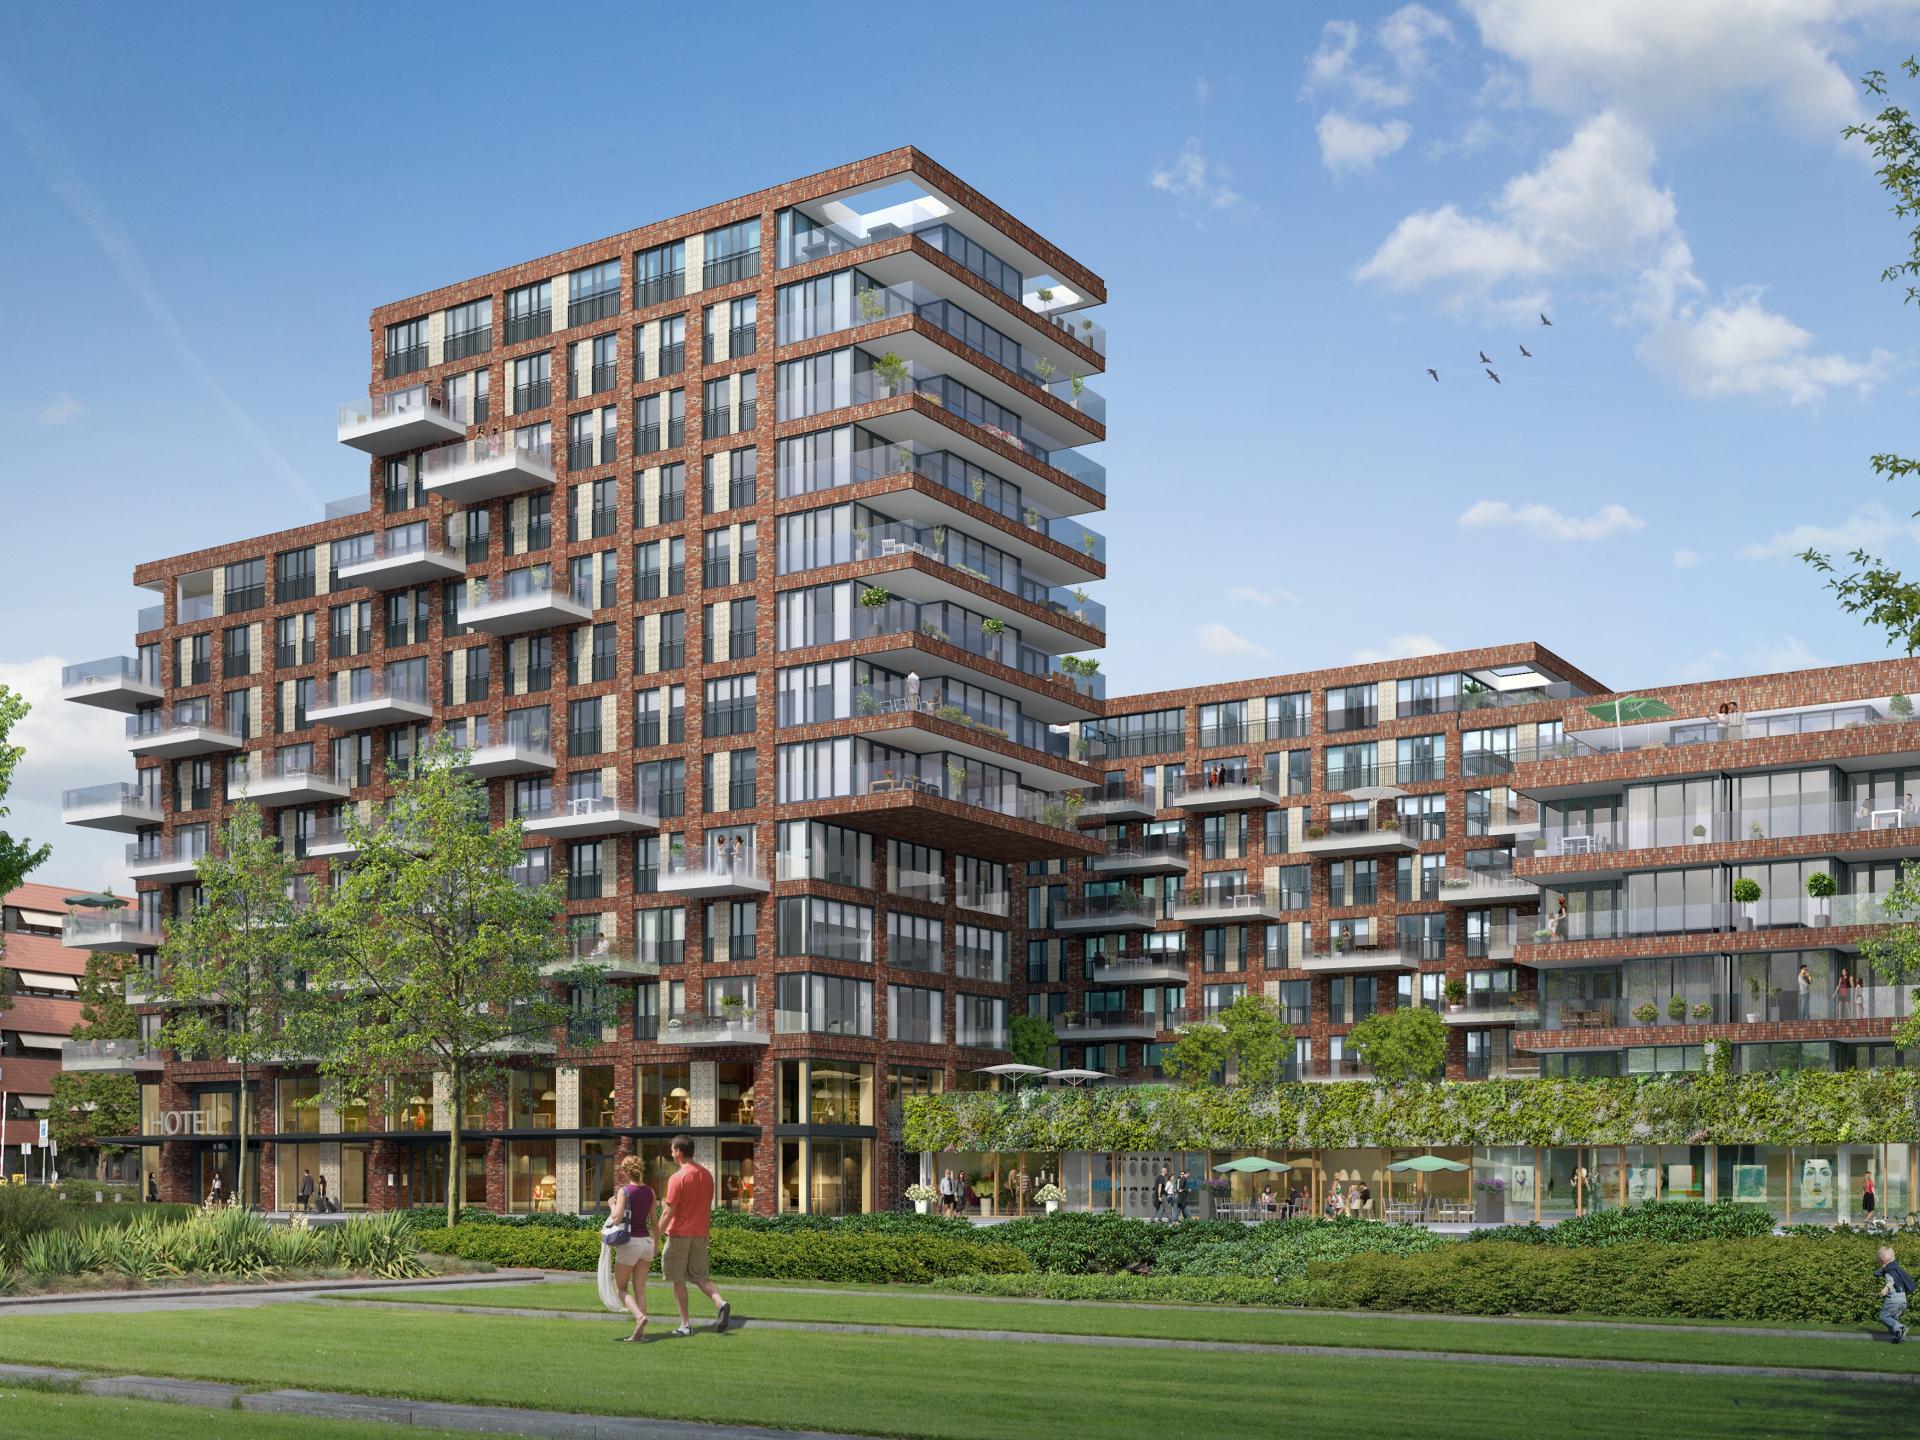 Exterior at The Garden Apartments, Amsterdam